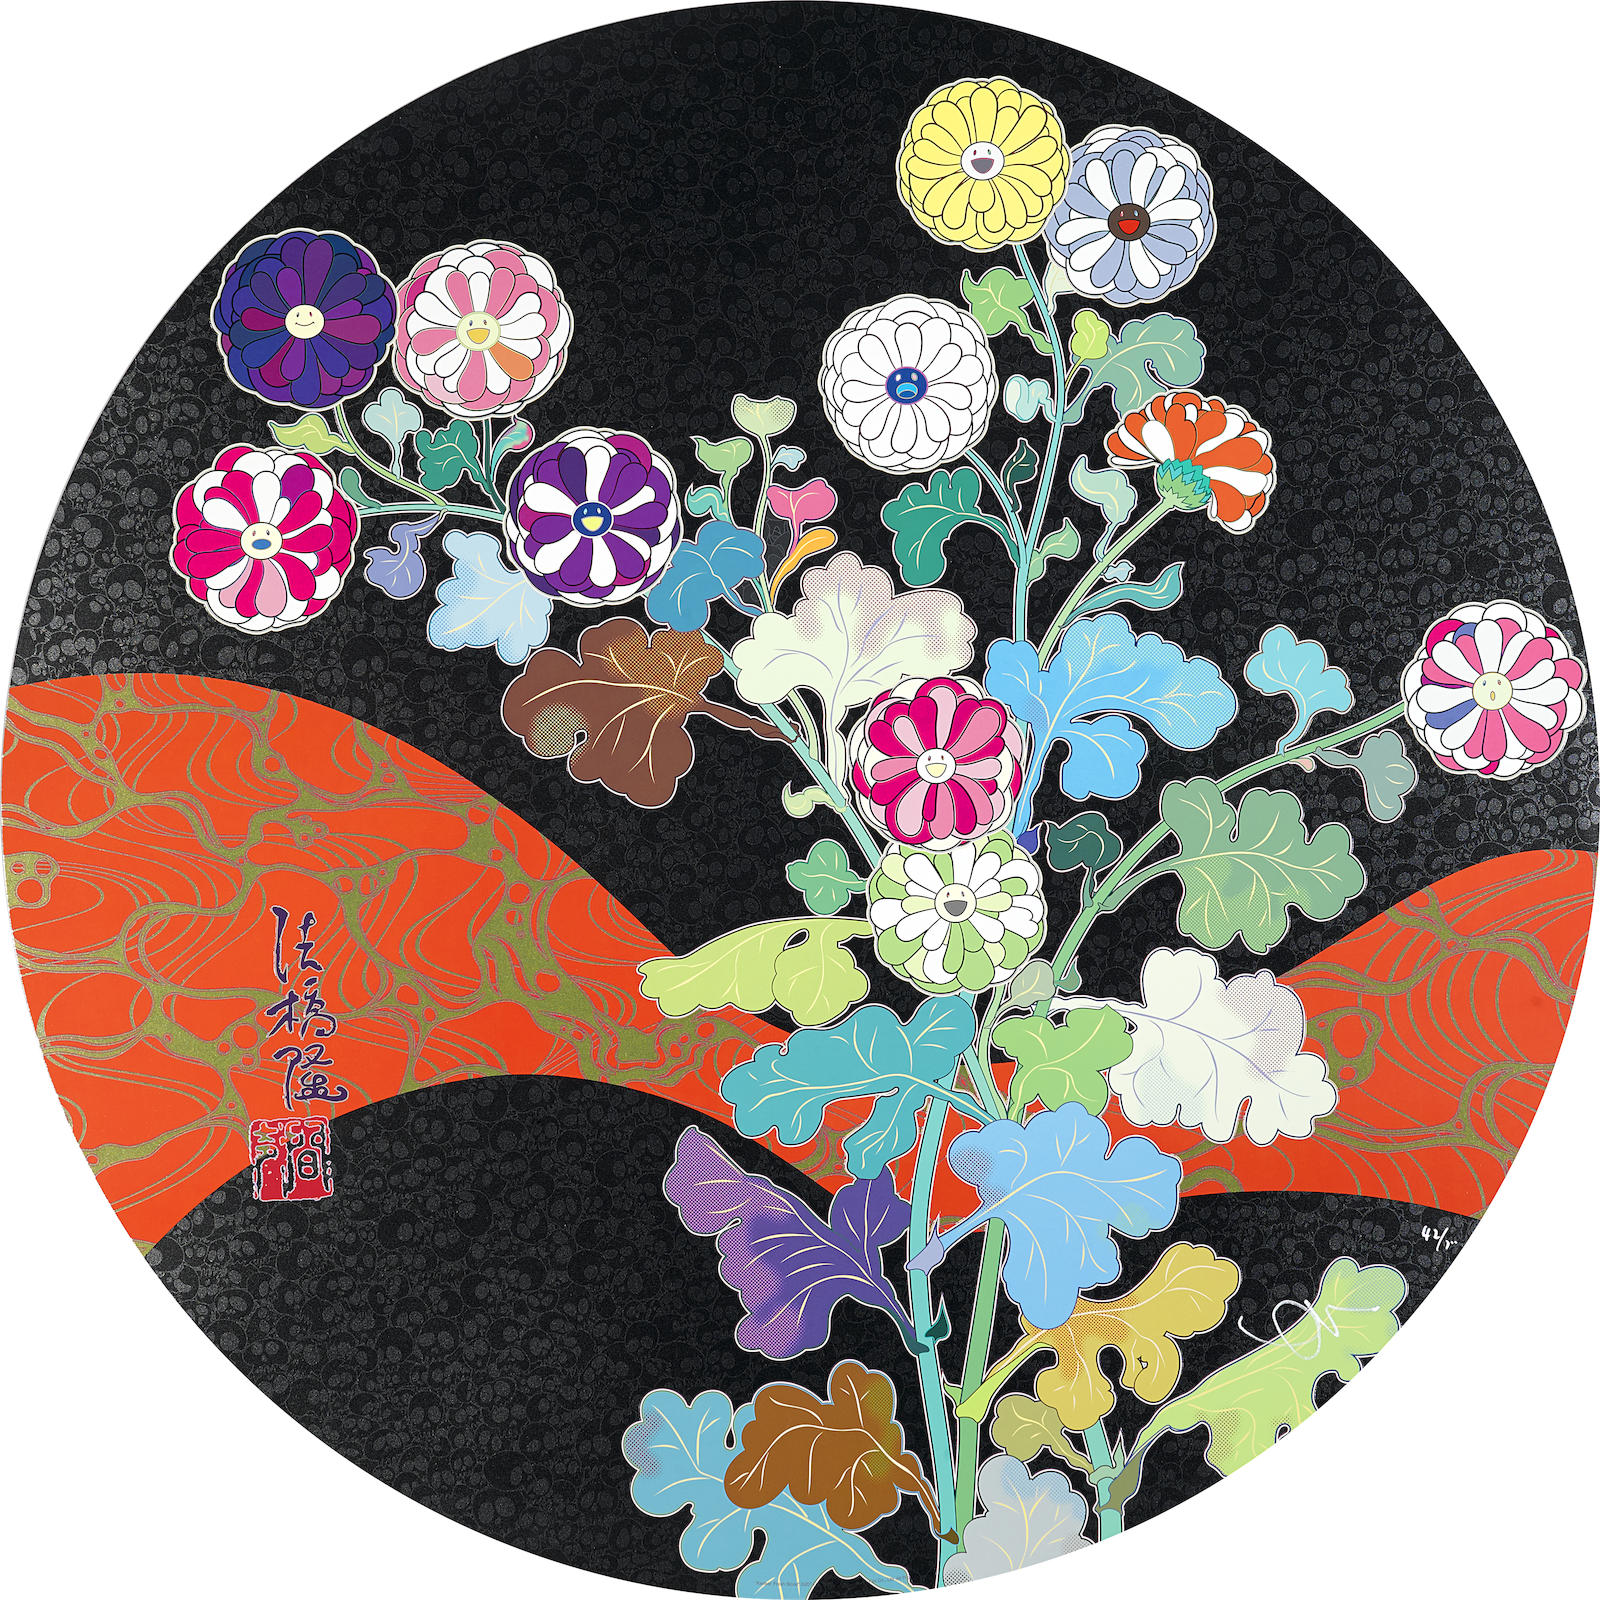 Takashi Murakami-Kansei Skulls; Kansei Fresh Blood, 2010; 2014-2014